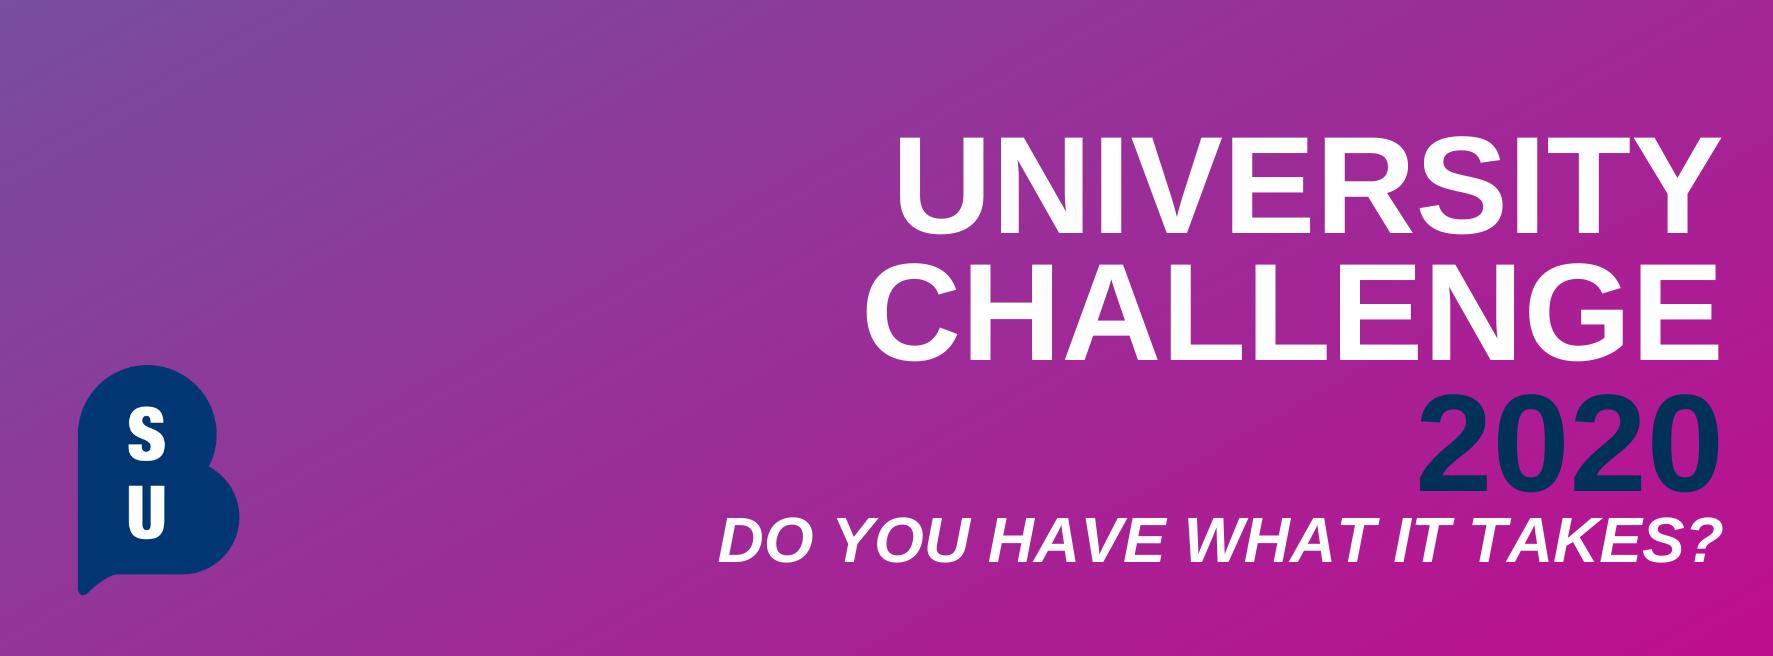 University challenge banner